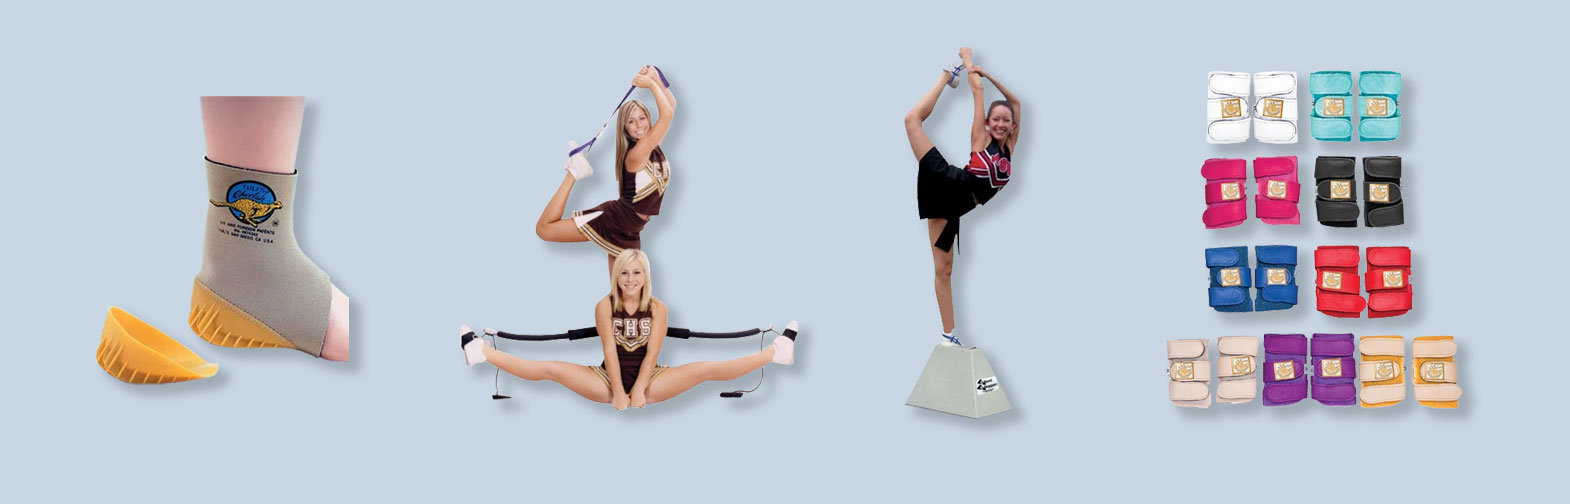 Cheerleading Sports Medicine Supplies